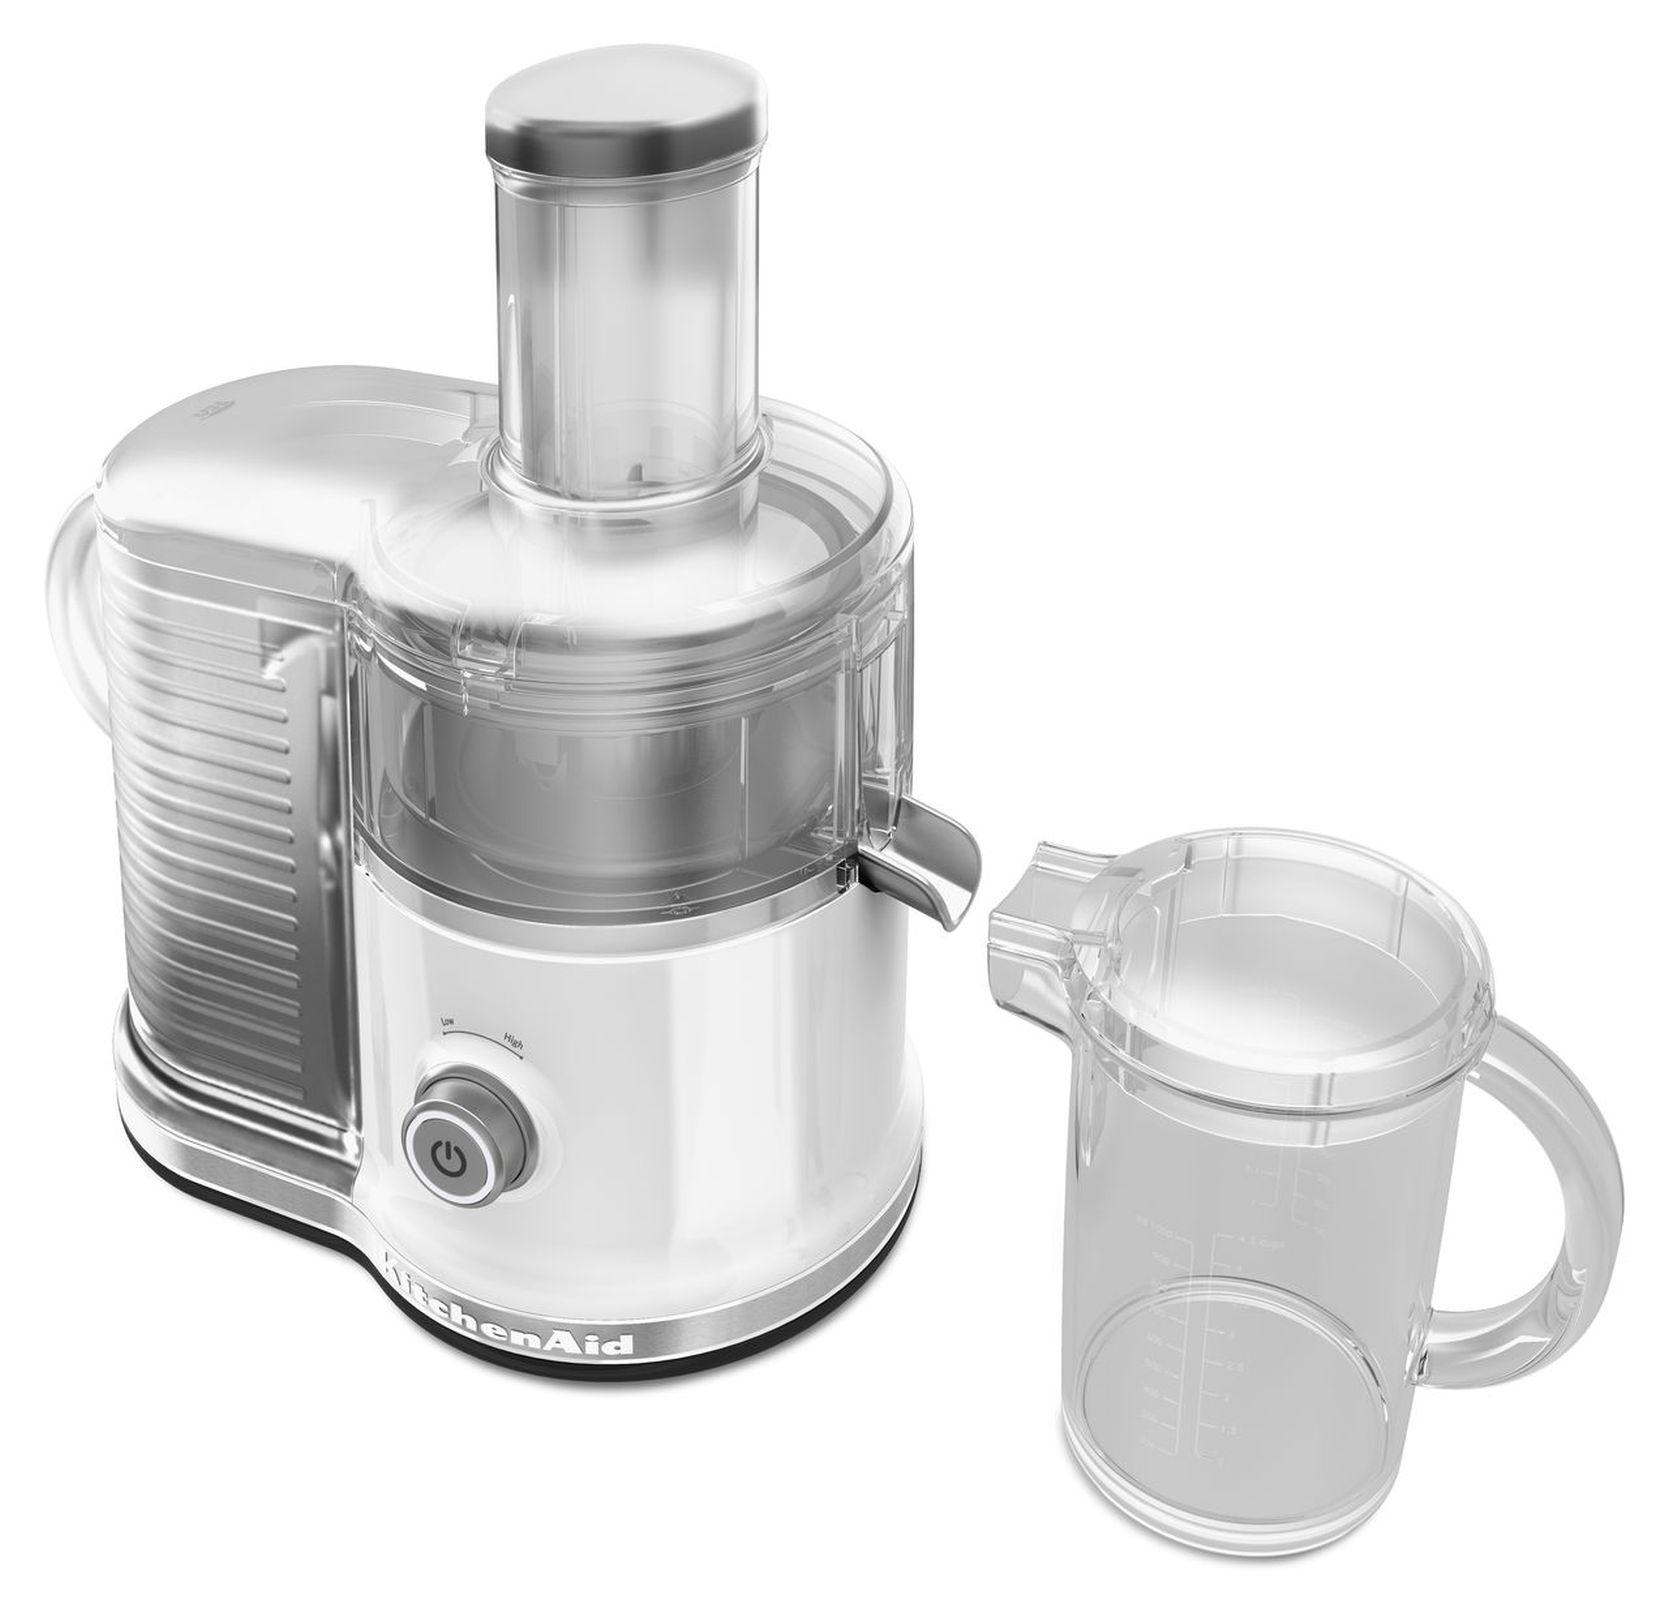 KitchenAid KVJ0333WH Easy Clean Juicer White Appliances Small Kitchen Appliances Juicers